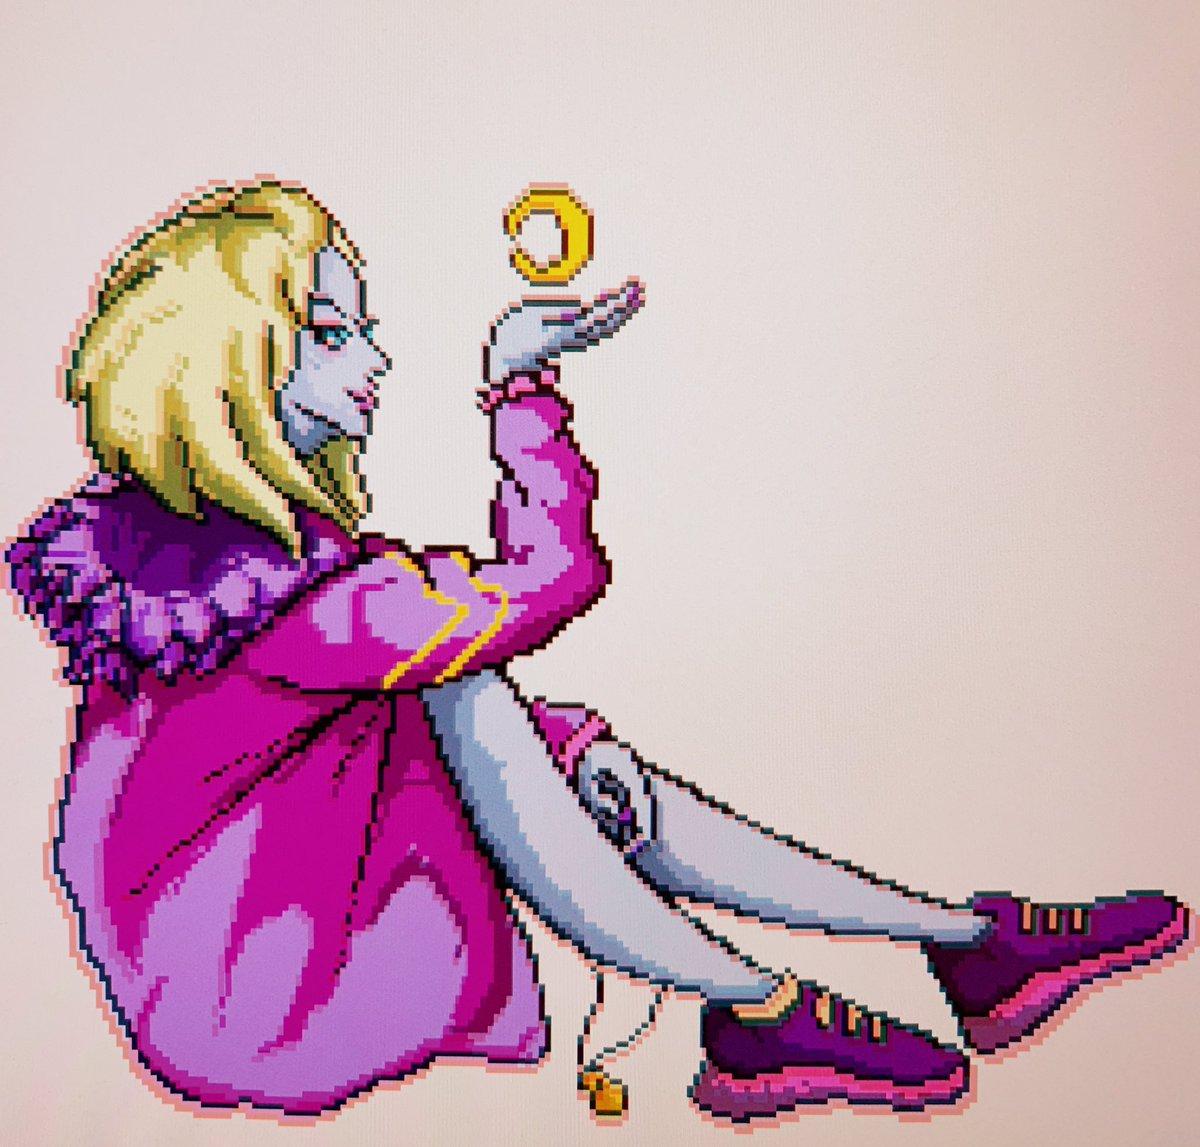 #pixelart #gameart RT @yi_ya_yi_ya_yo: WIP ..👀✍🏻 #drawing #pixel #pixelart #ドット絵 #destiny2 #marasov #Retro #moonaestetic